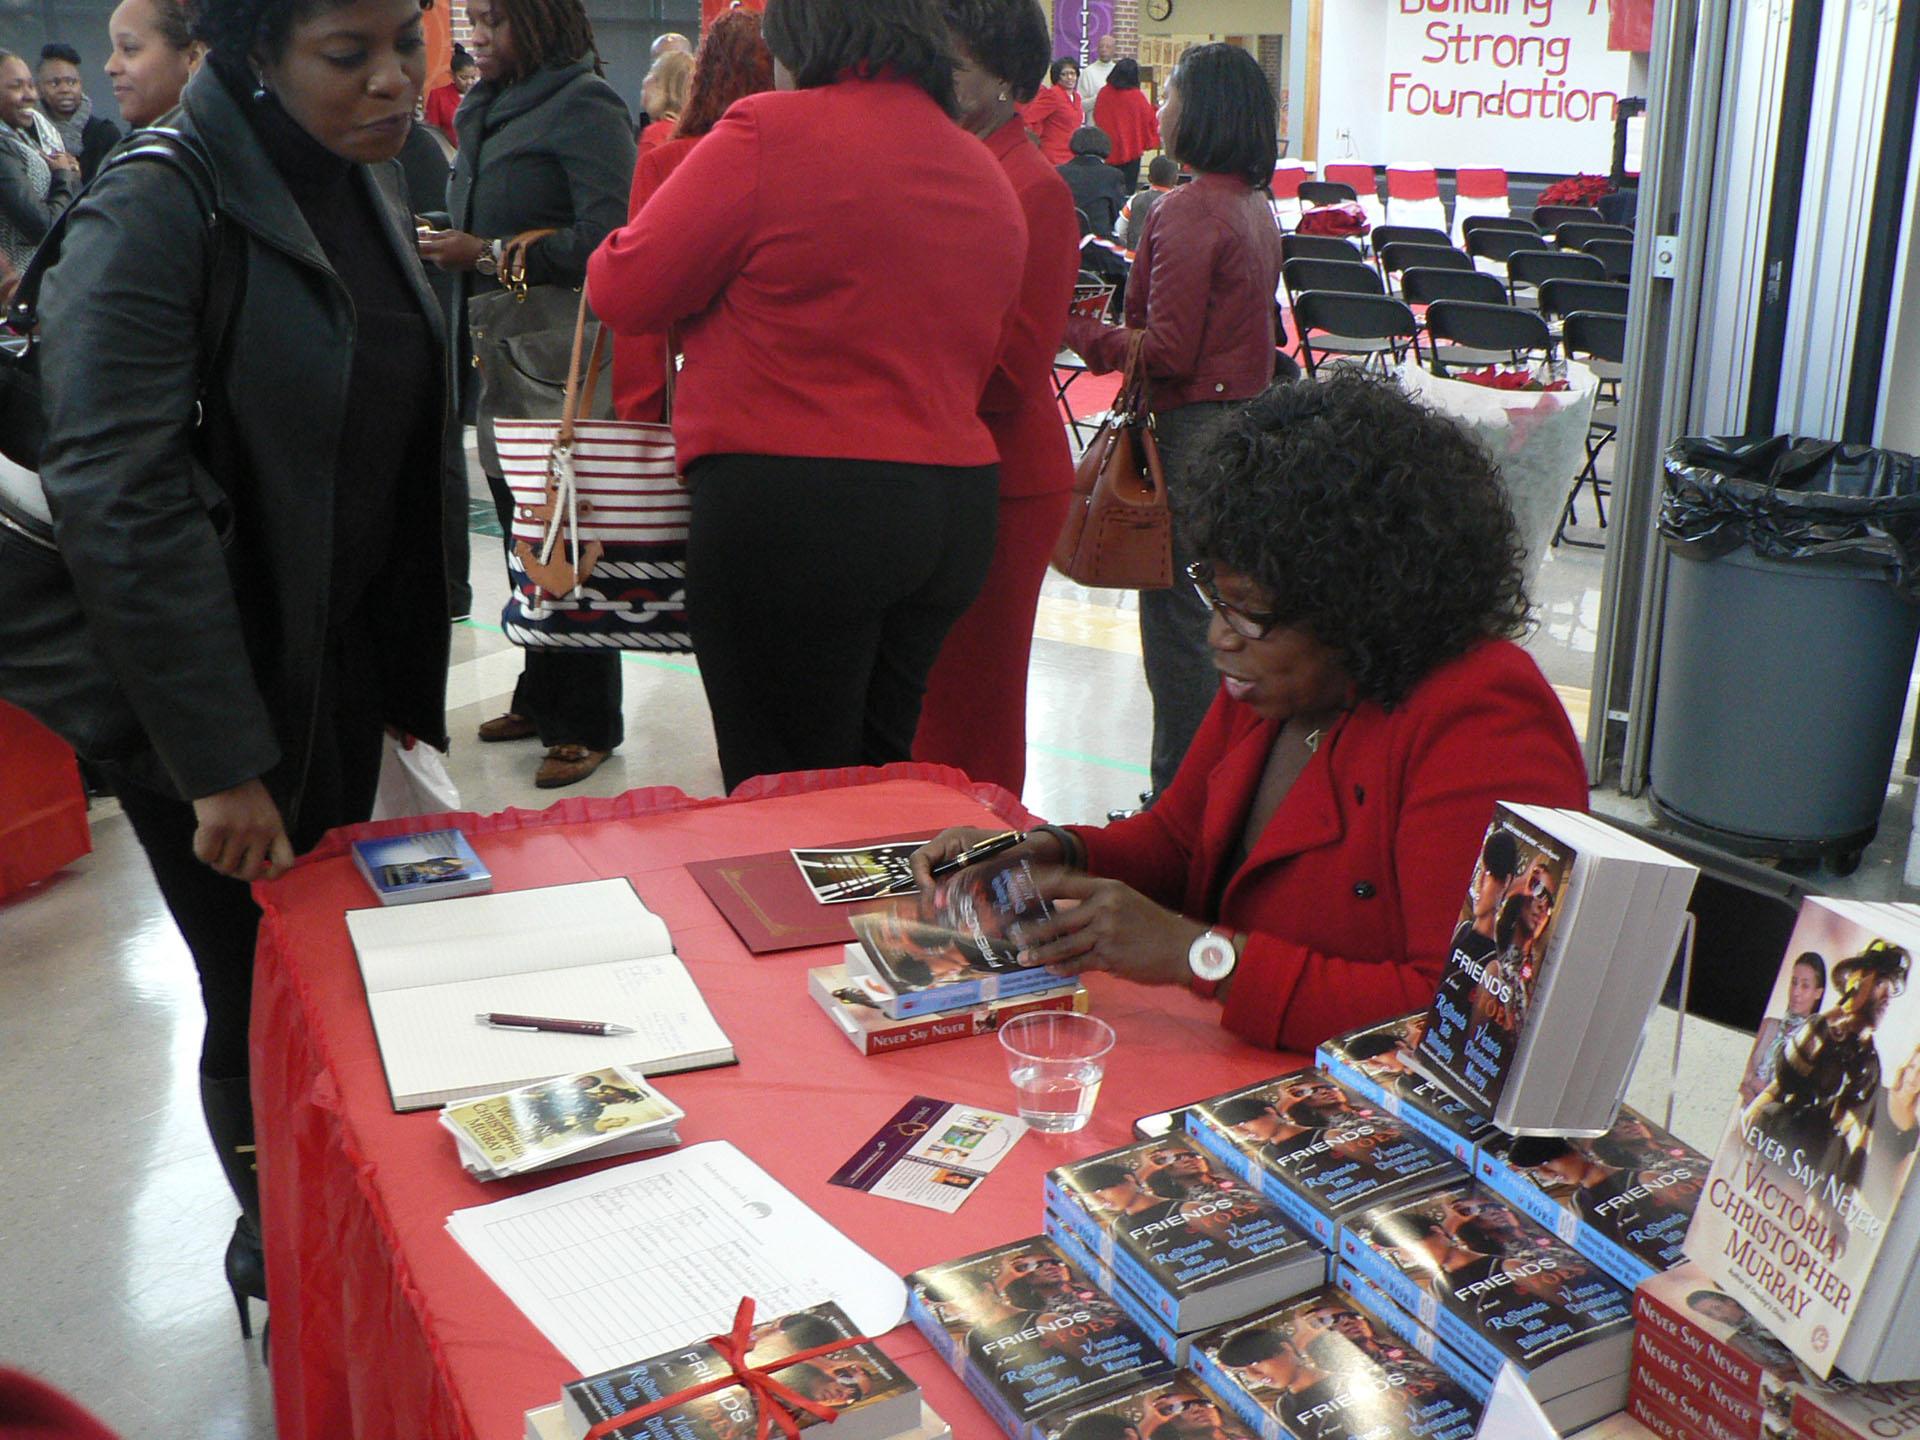 Red Carpet Showcase event highlighting authors, artist